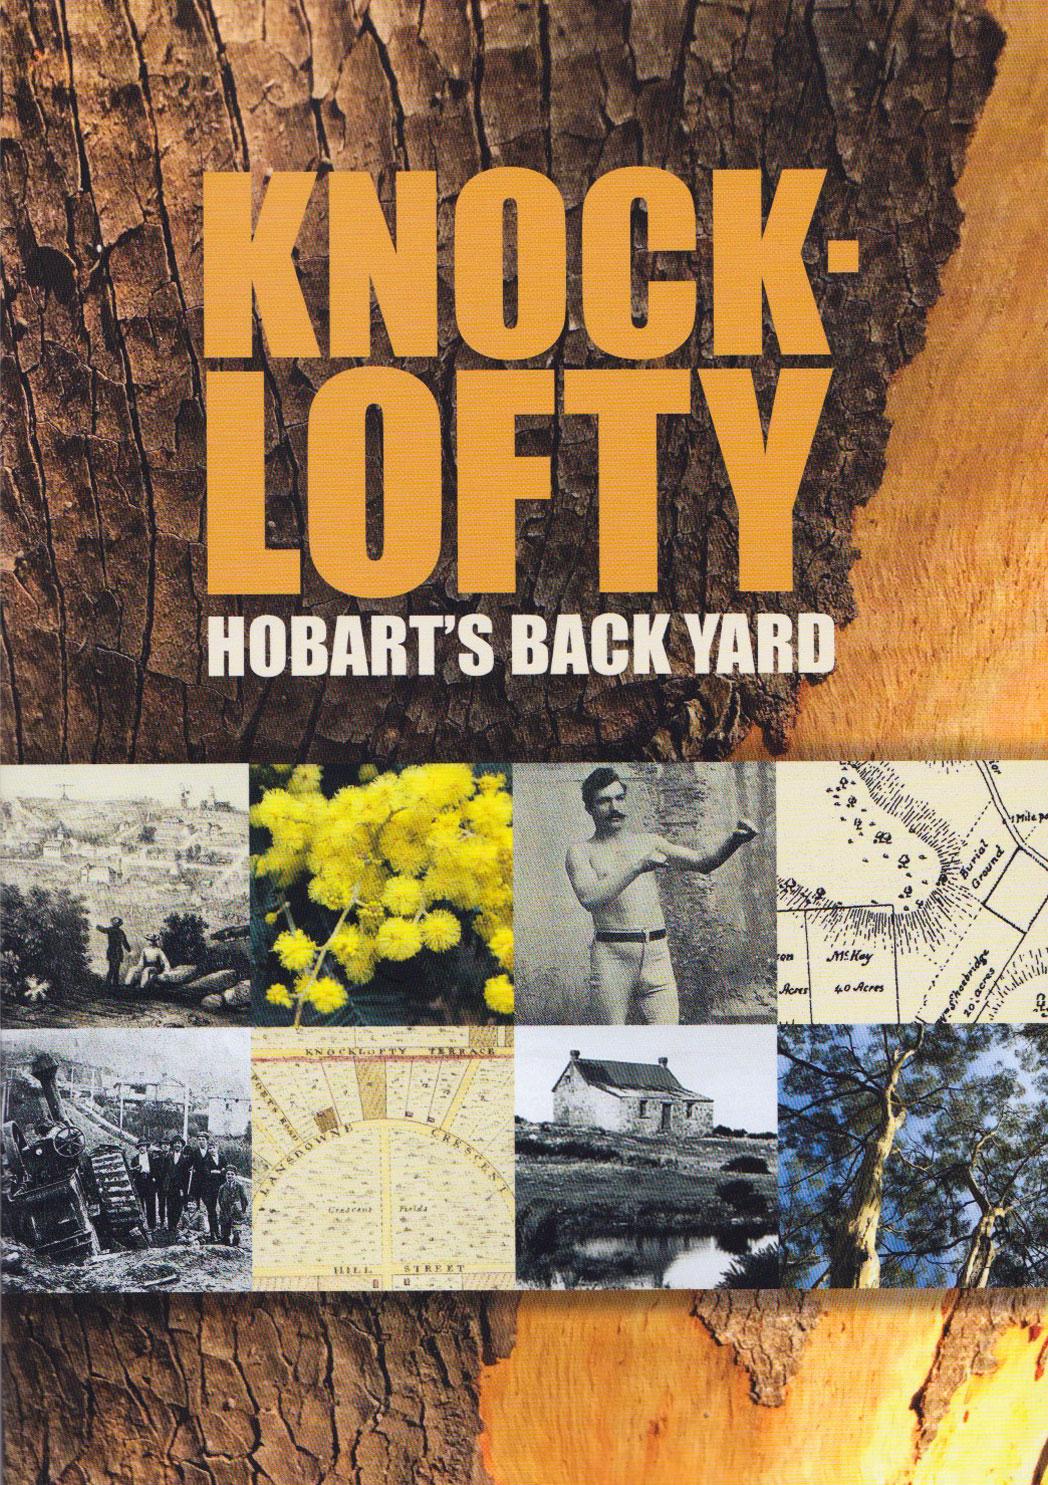 Knocklofty - Hobart's Back Yard